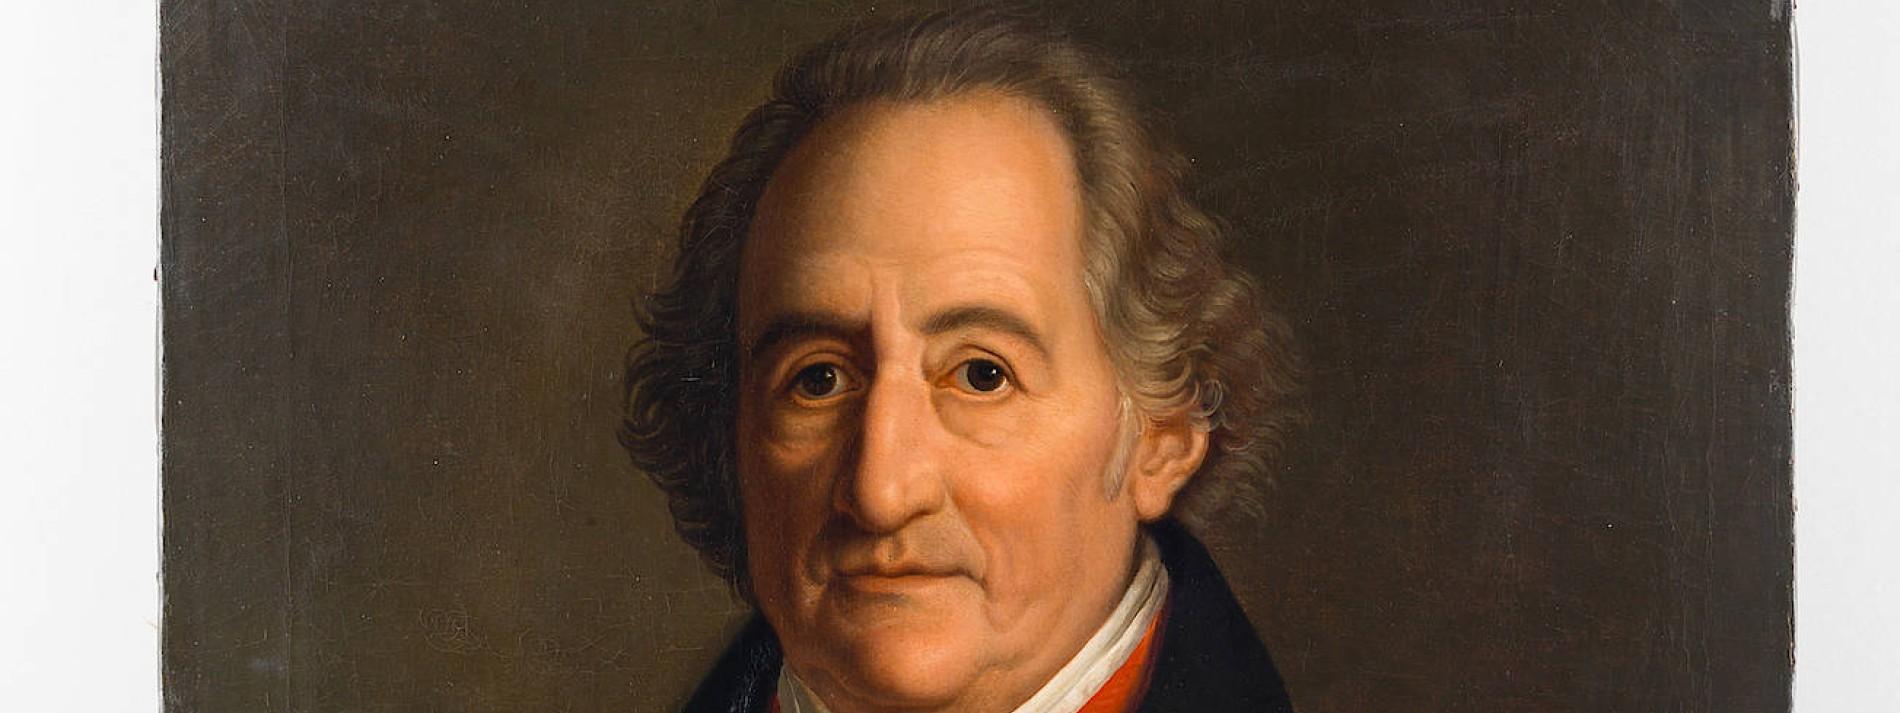 Über ehe goethe die Goethe über